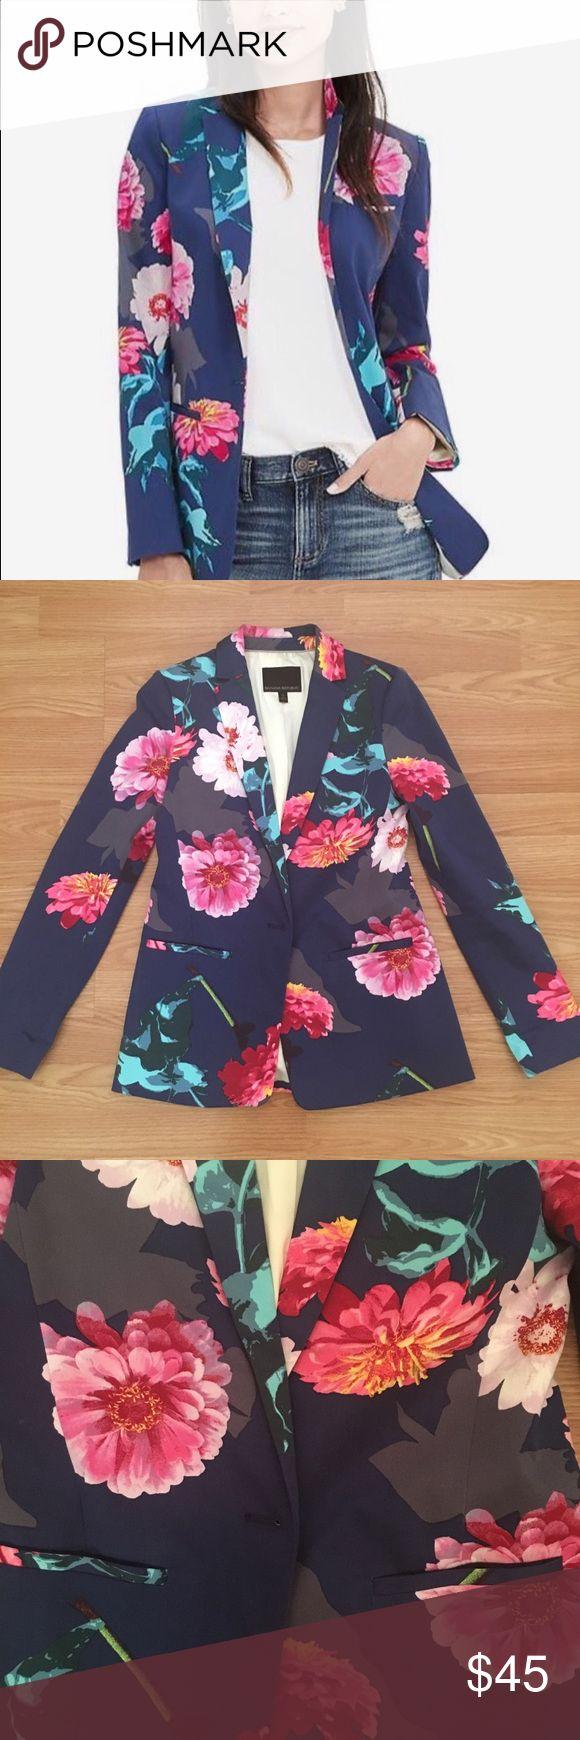 Banana Republic floral blazer Super cute Banana Republic floral blazer. Great condition!  Check out matching pants in my closet. Banana Republic Jackets & Coats Blazers